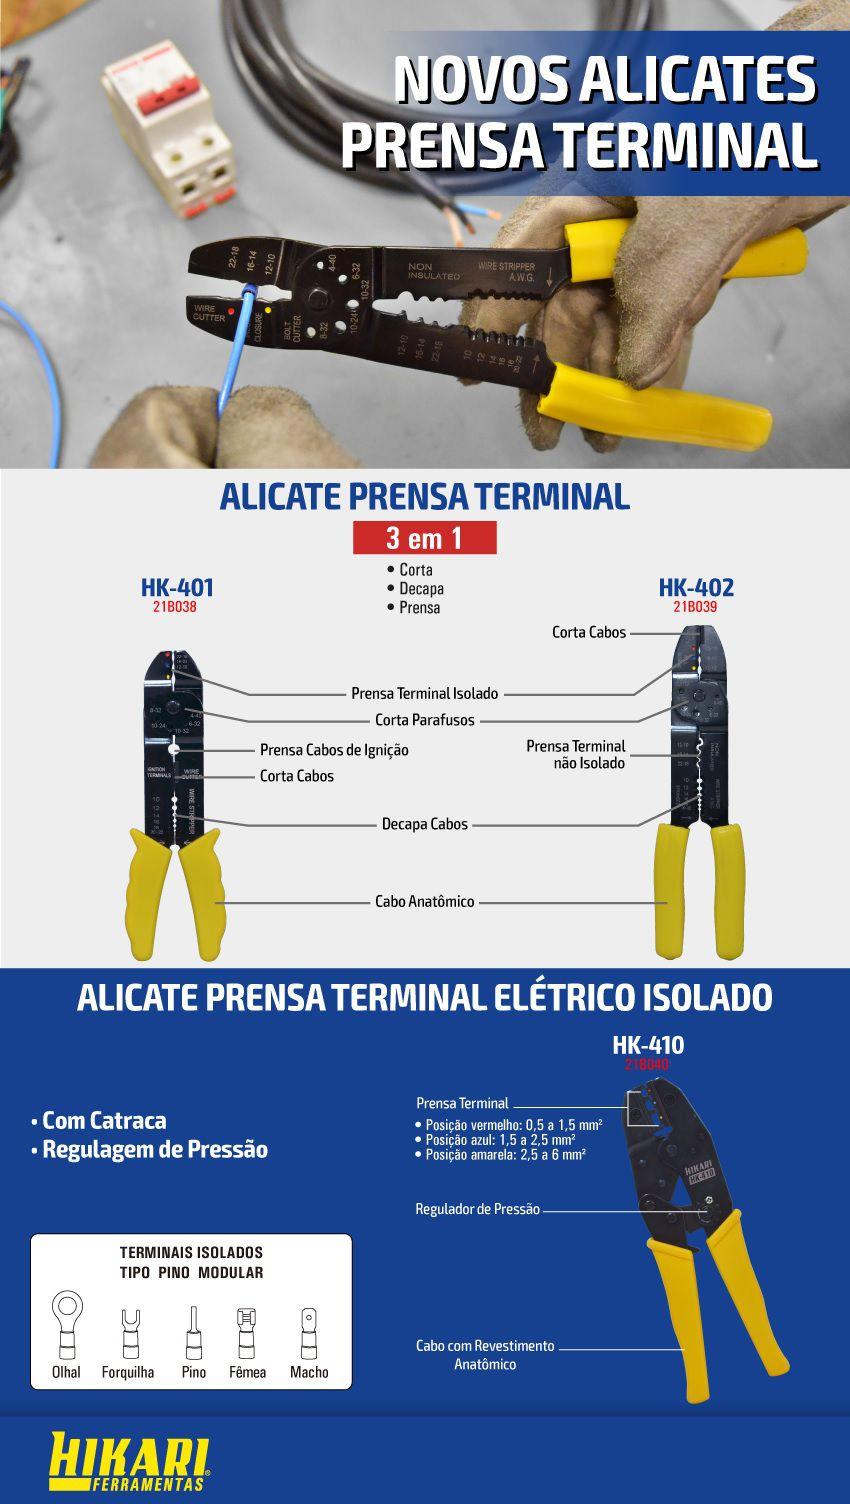 Alicate Prensa Terminal Hikari HK-402  - MRE Ferramentas